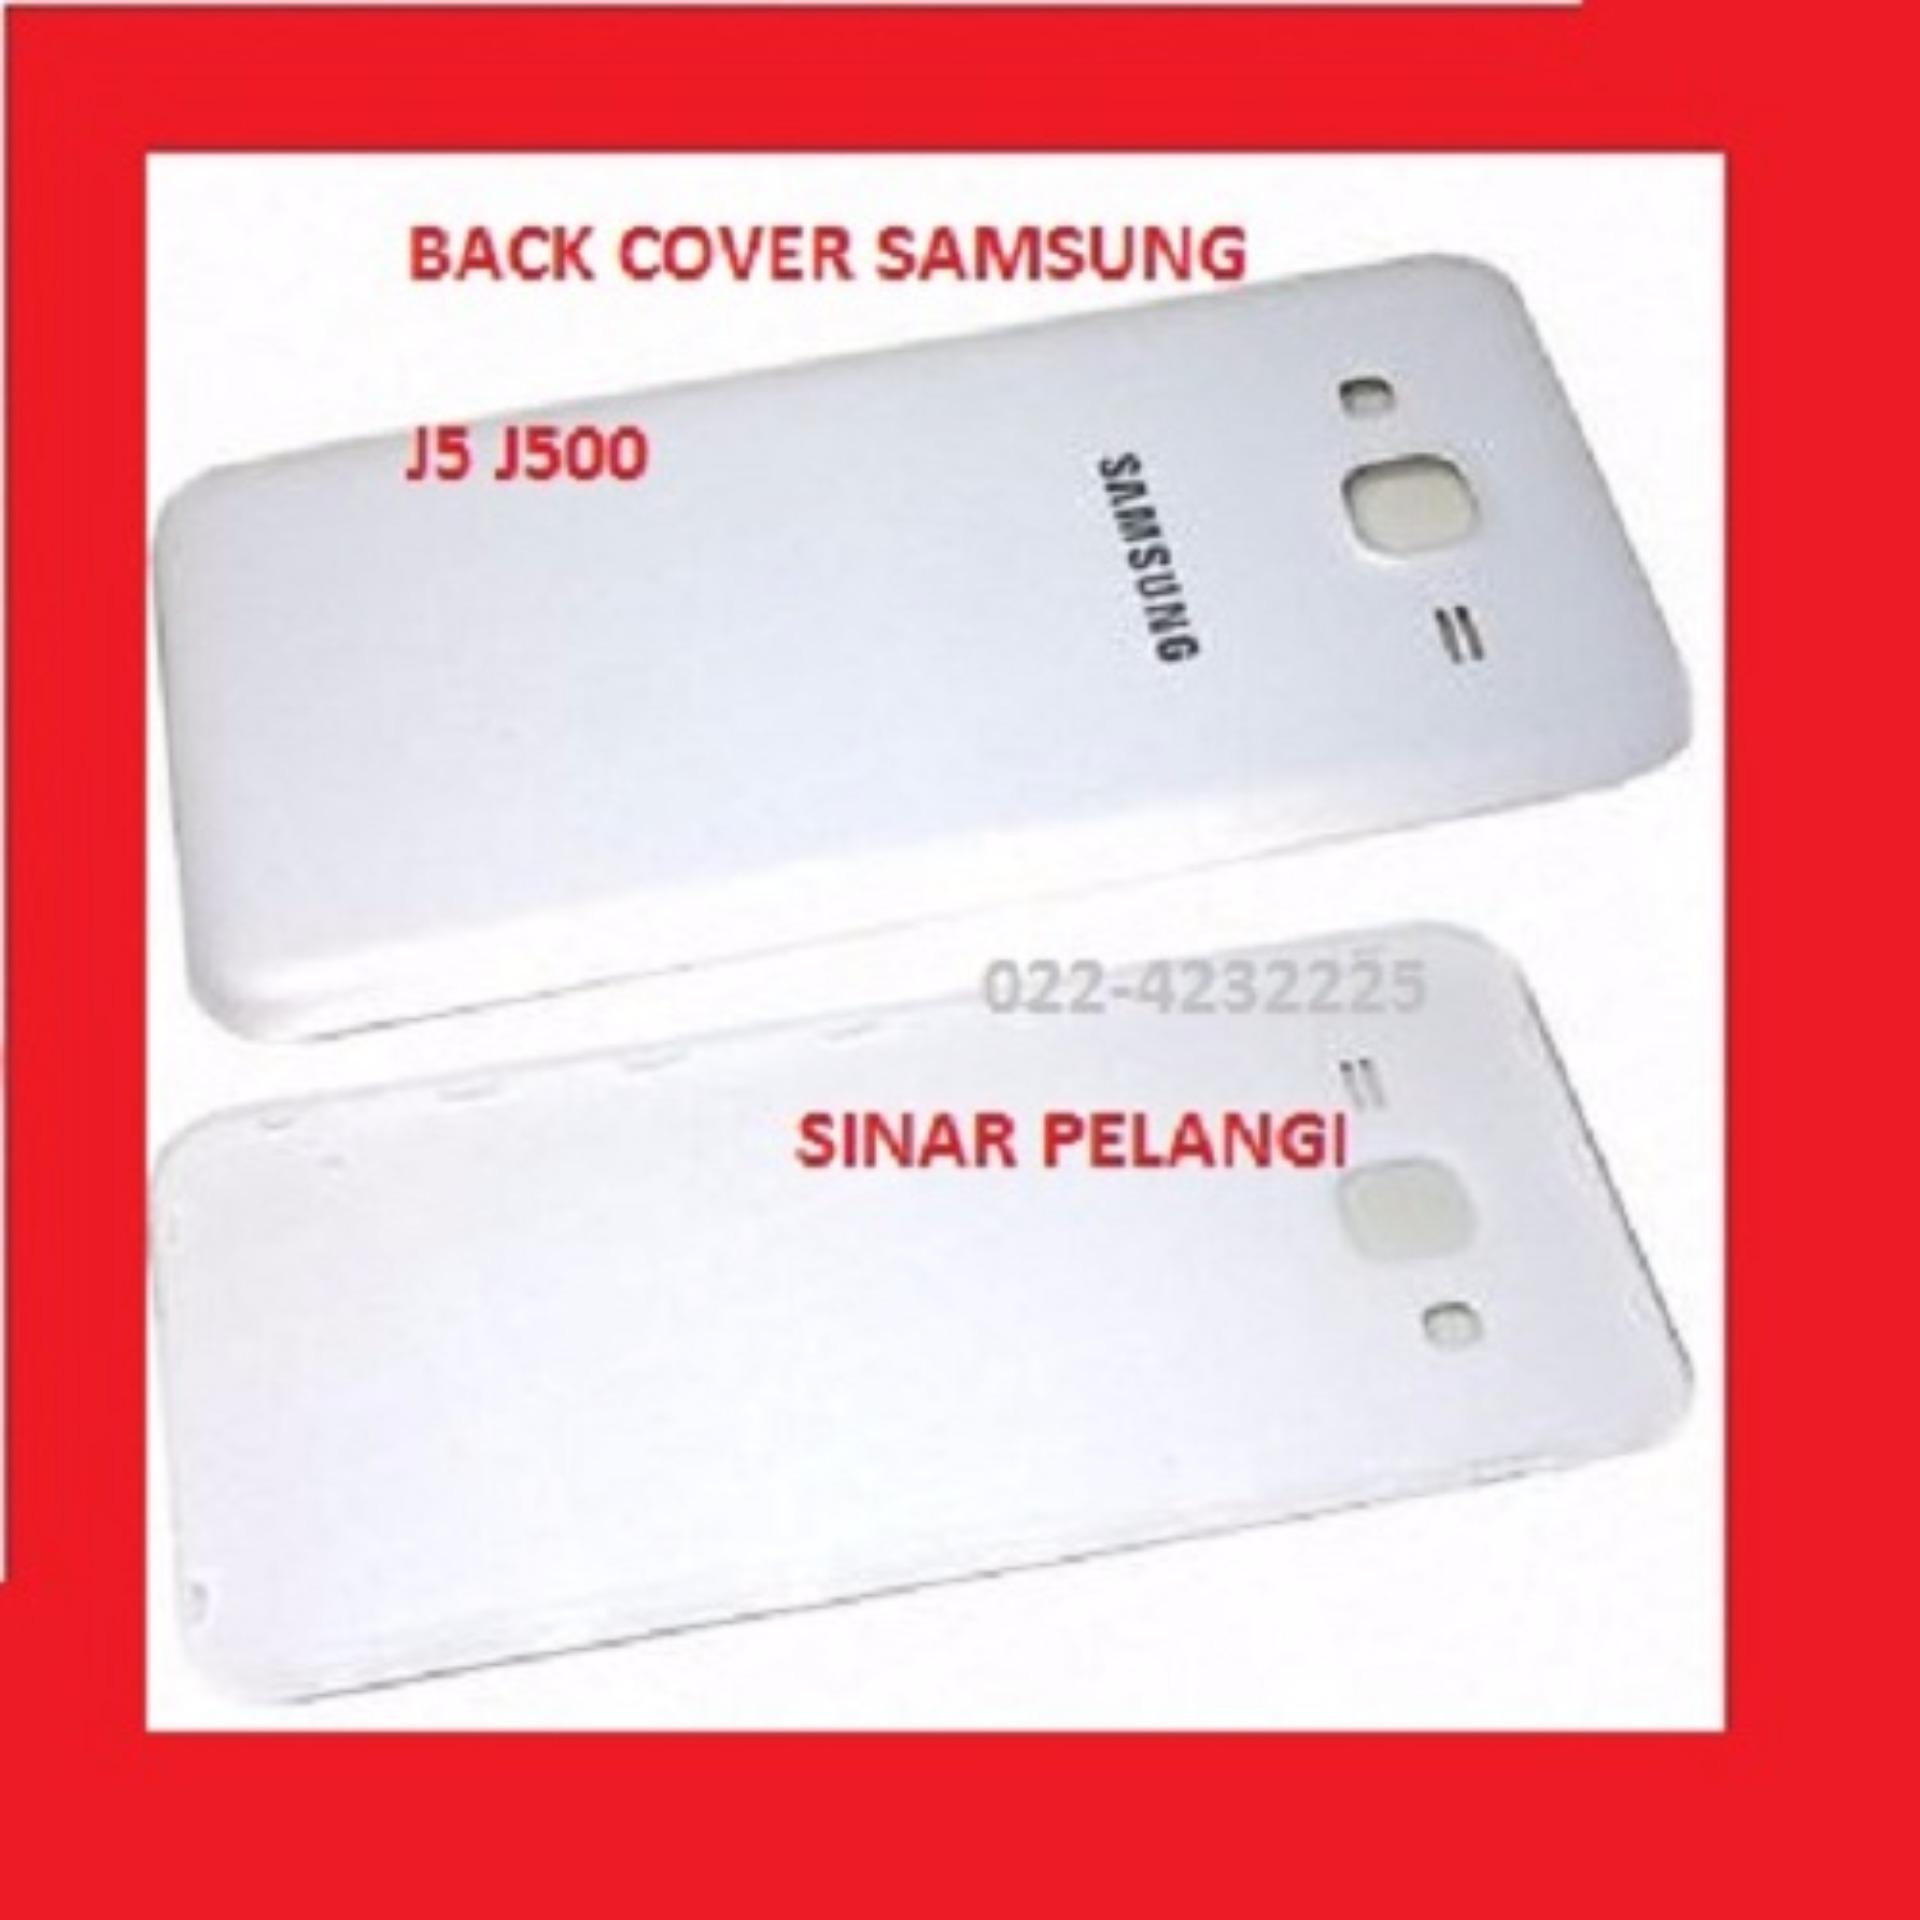 SAMSUNG GALAXY J500 J5 WHITE  BATTERY BACK COVER BACK DOOR TUTUP BATERAI CASING BELAKANG ORIGINAL 904289